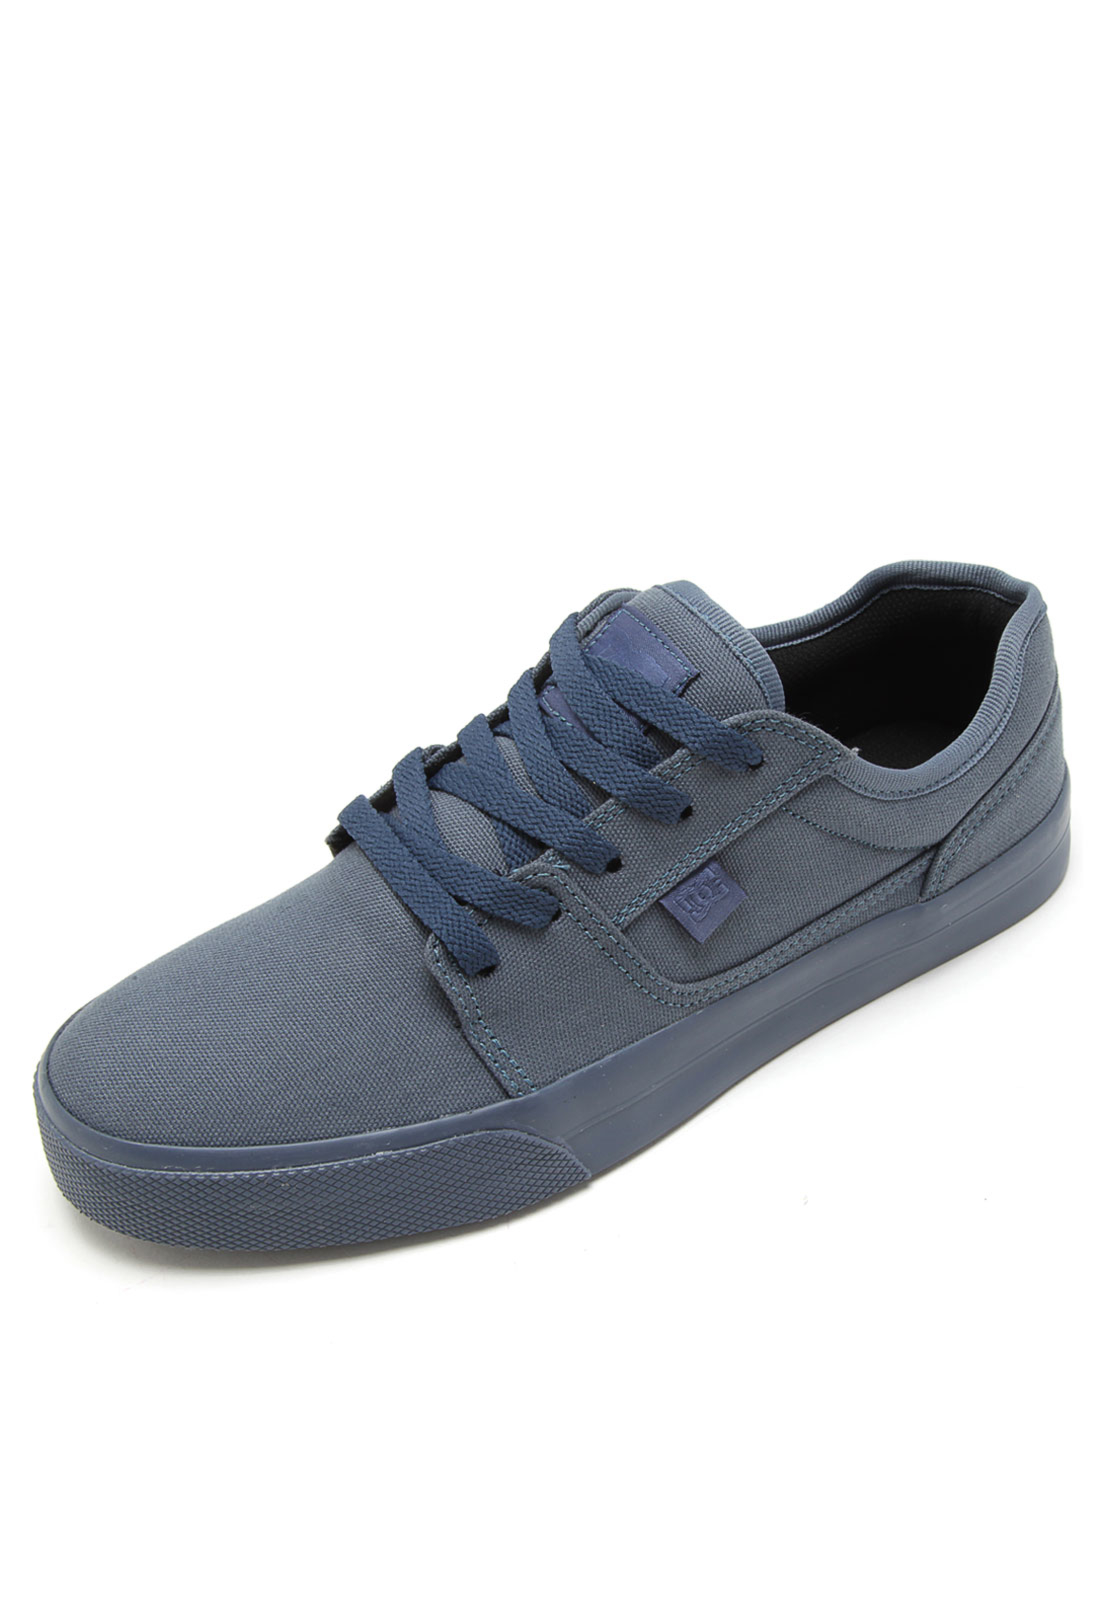 Tênis DC Shoes Tonik TX Azul | Sapatos, Tenis e Comprar tênis